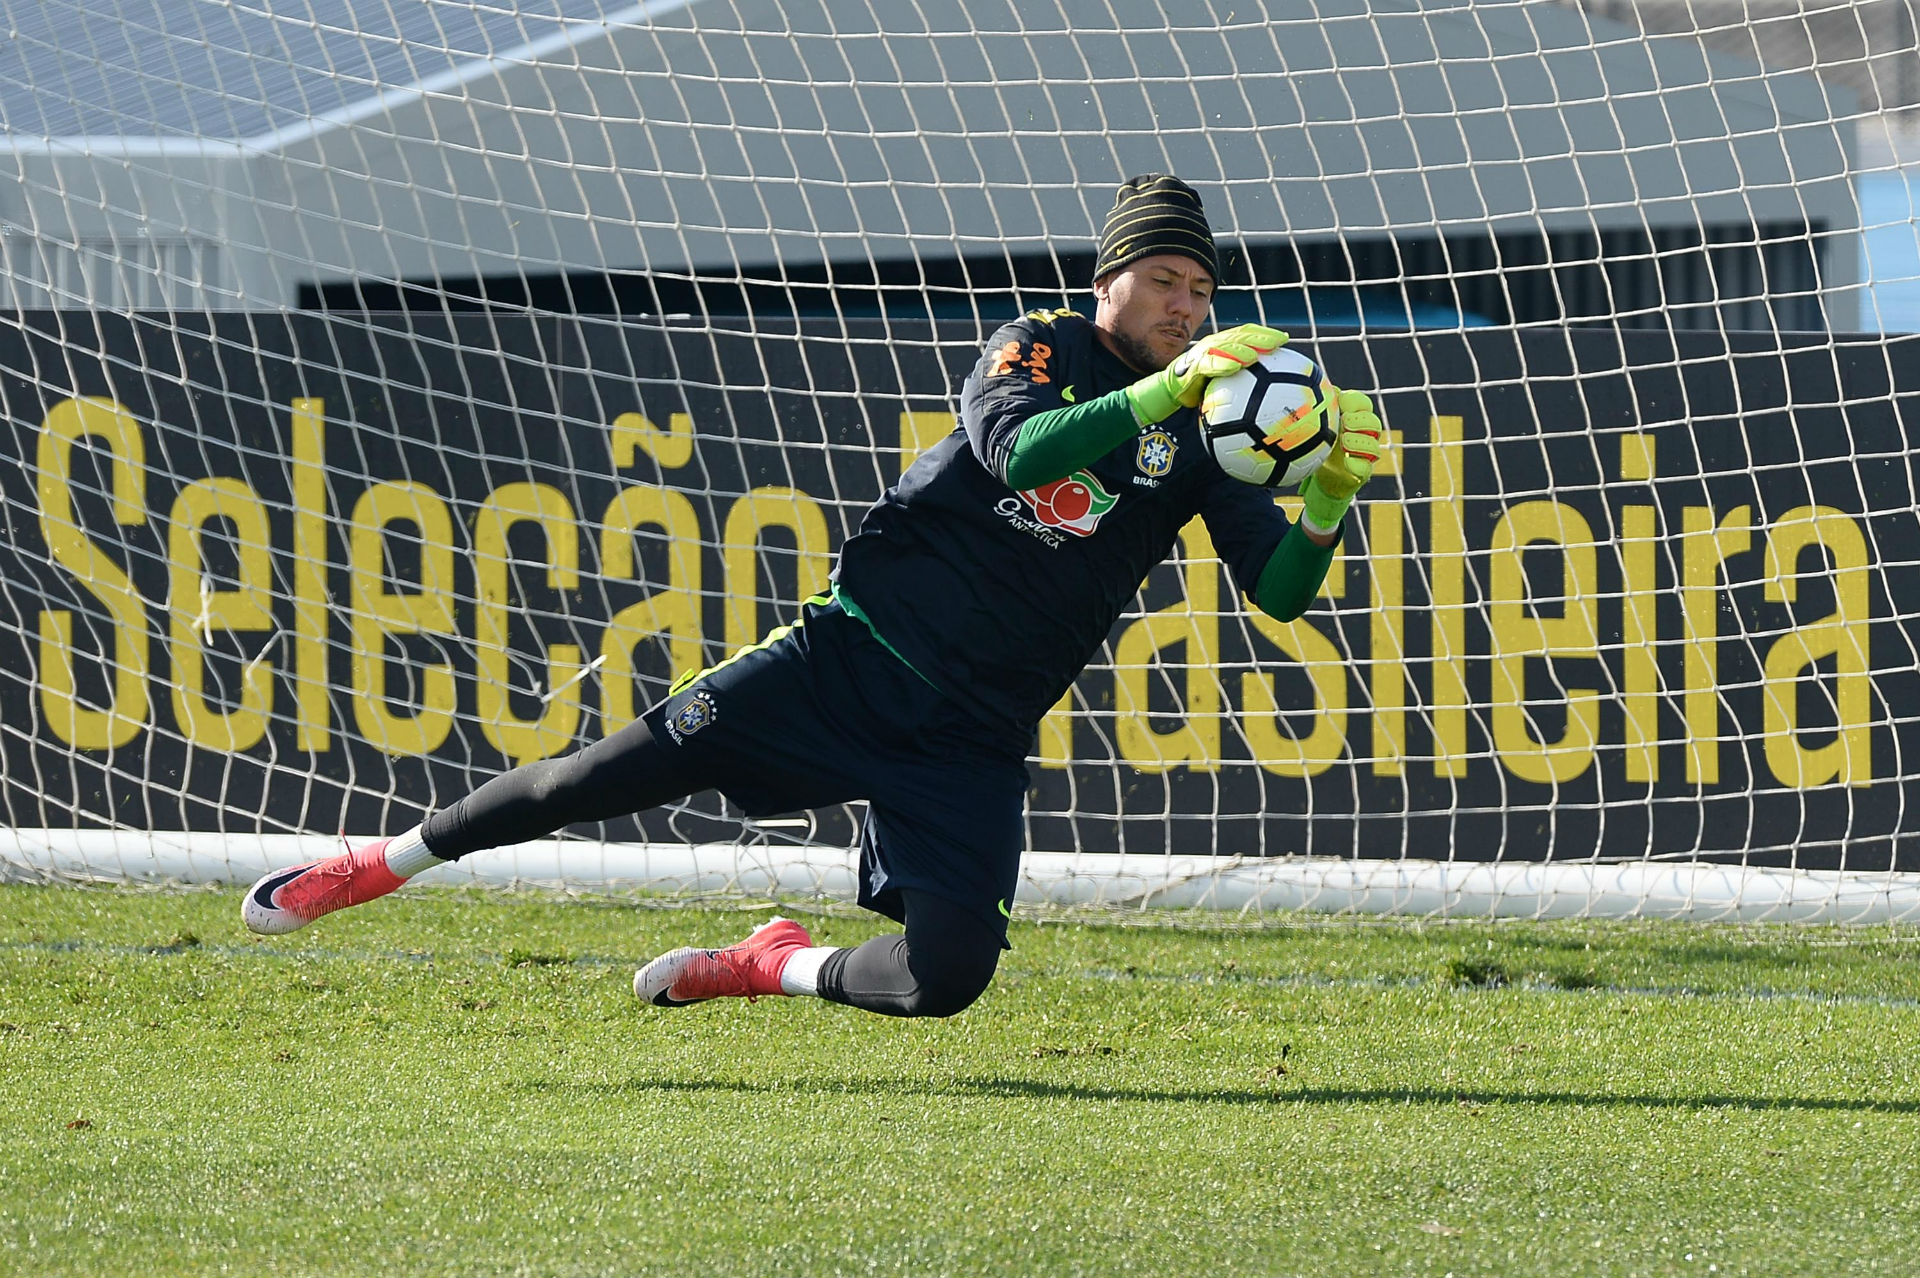 Diego Alves Lakeside Stadium Brazil